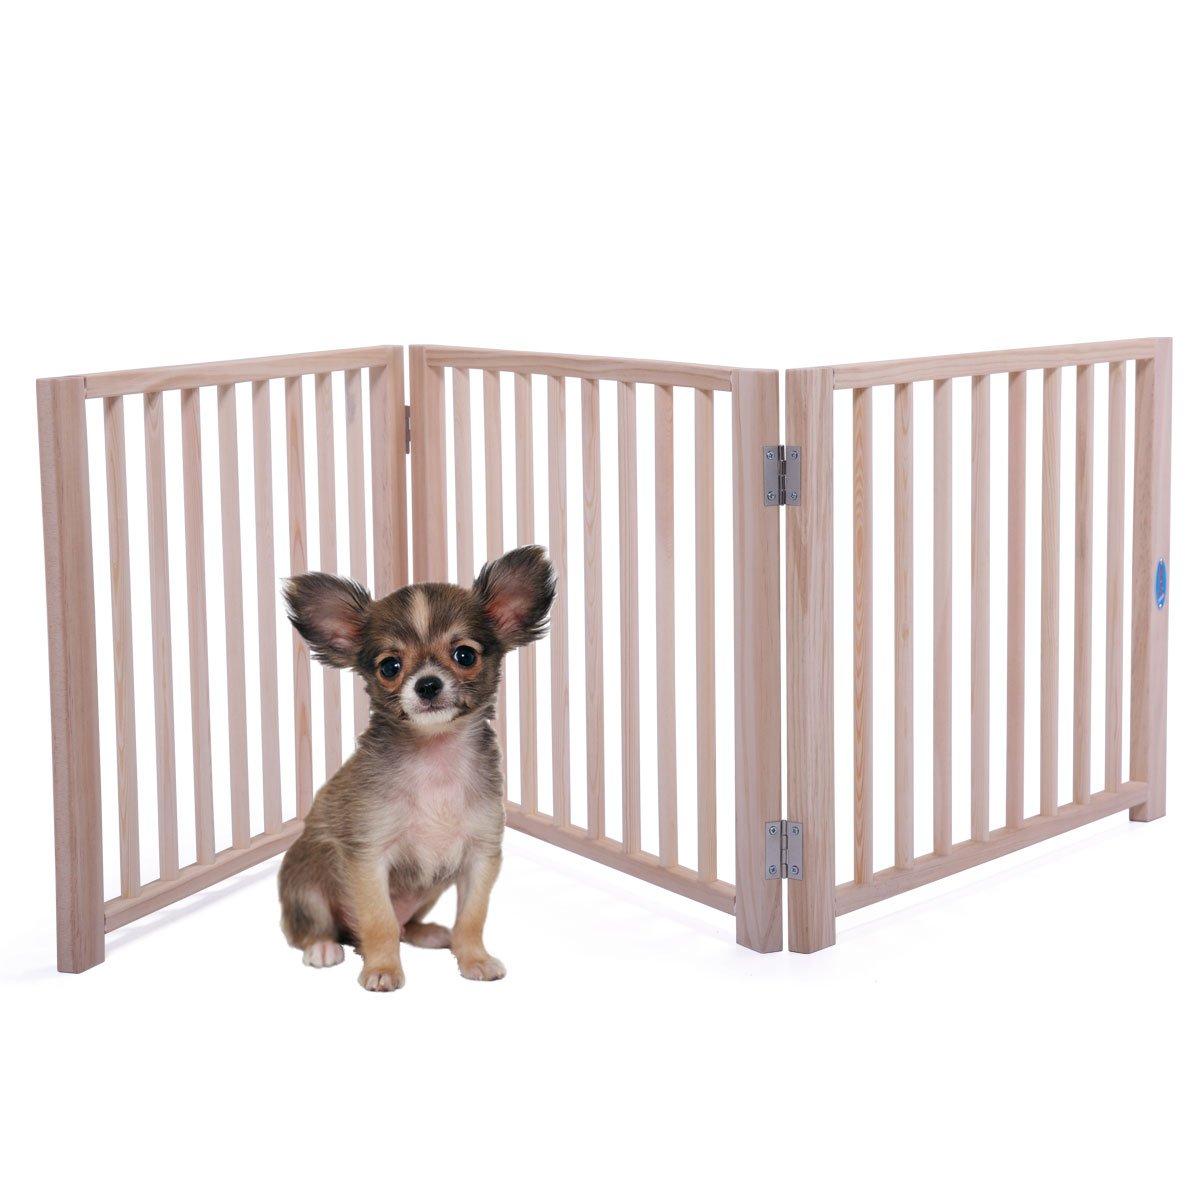 Folding Solid Wooden Pet Dog Fence Playpen Gate 3 Panel Free Standing Indoor